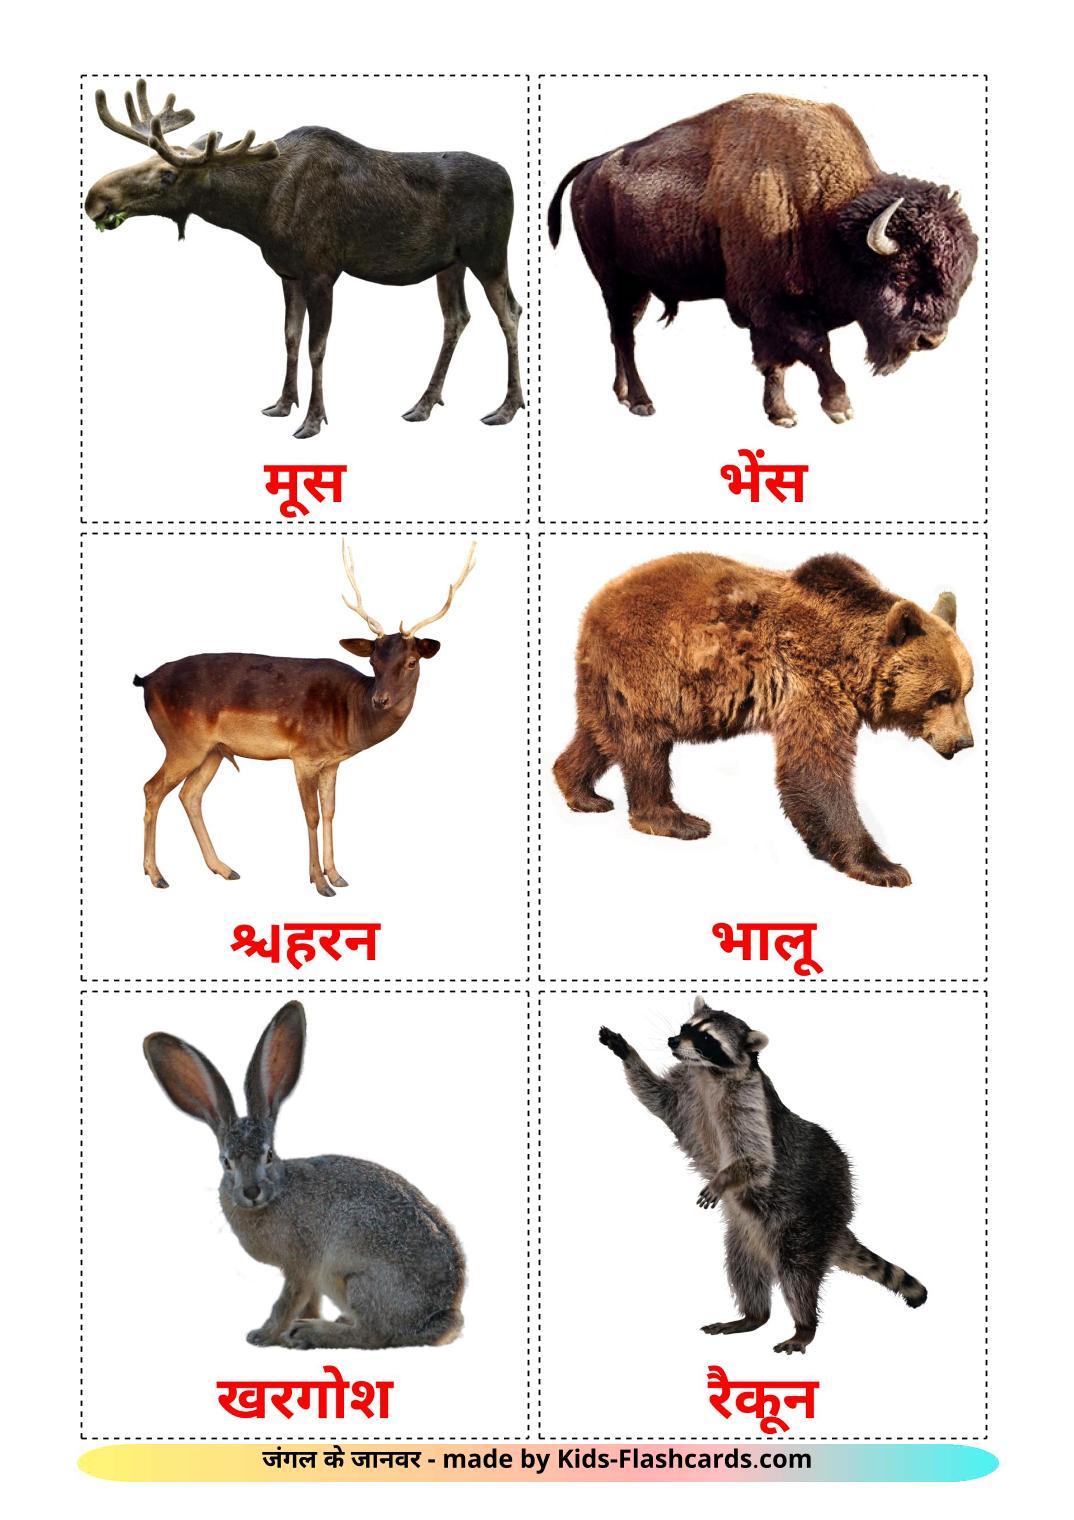 Forest animals - 22 Free Printable hindi Flashcards